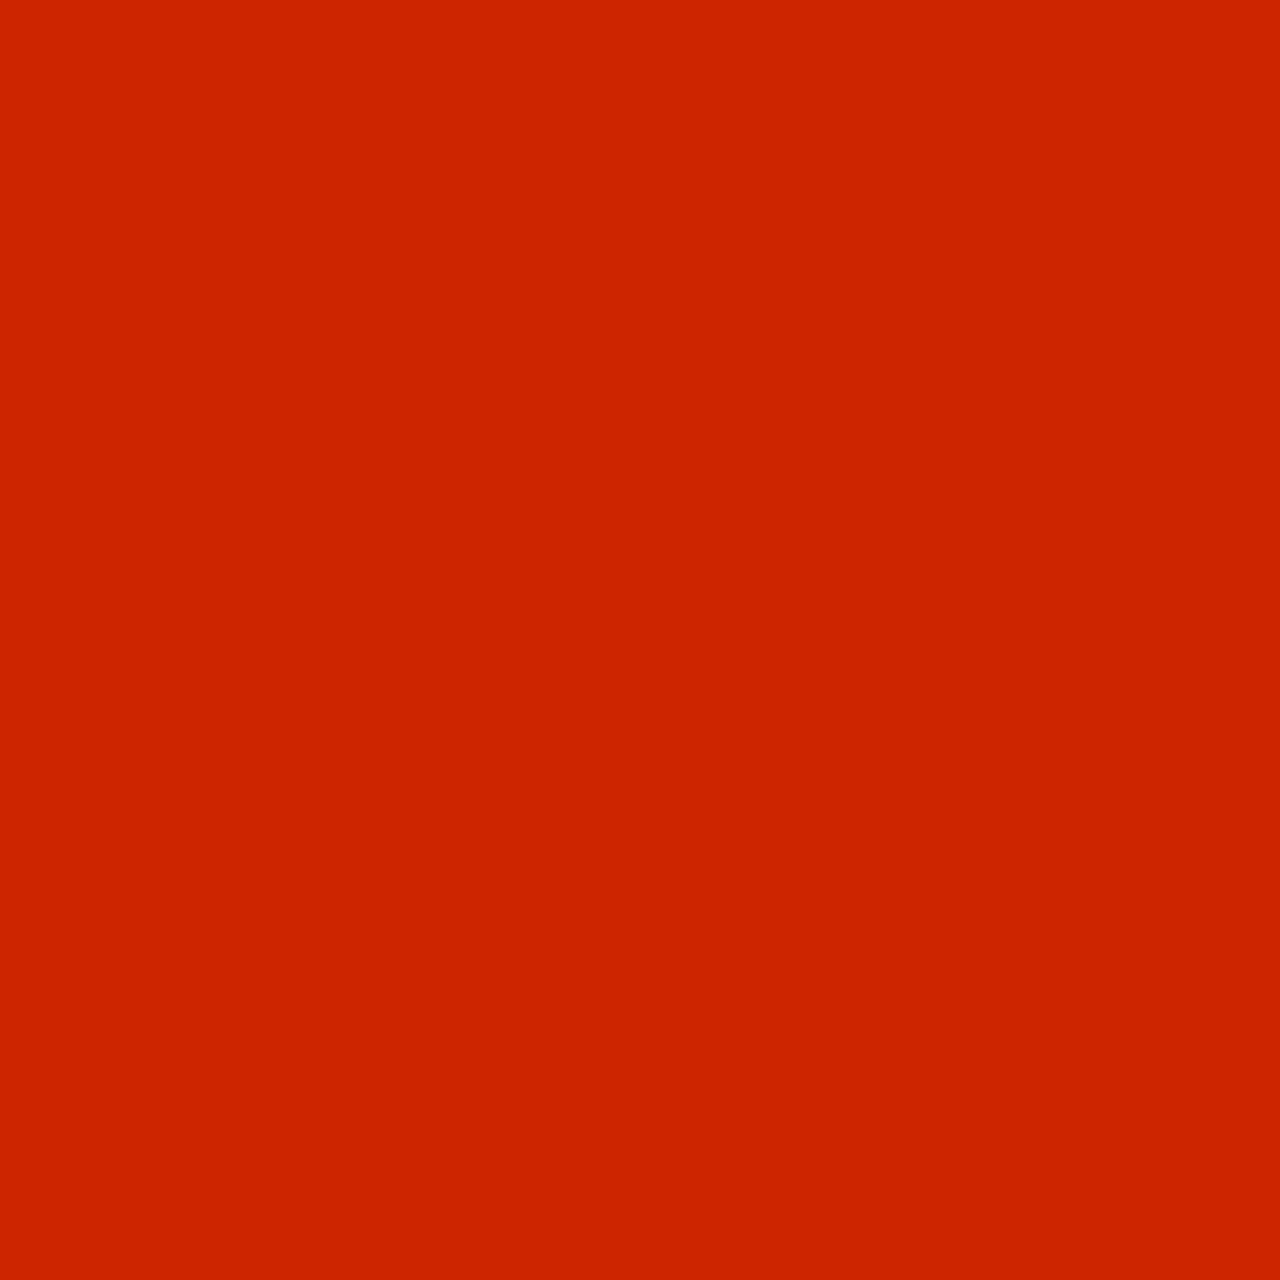 "#2001 Rosco Gels Roscolux Storaro Red, 20x24"""